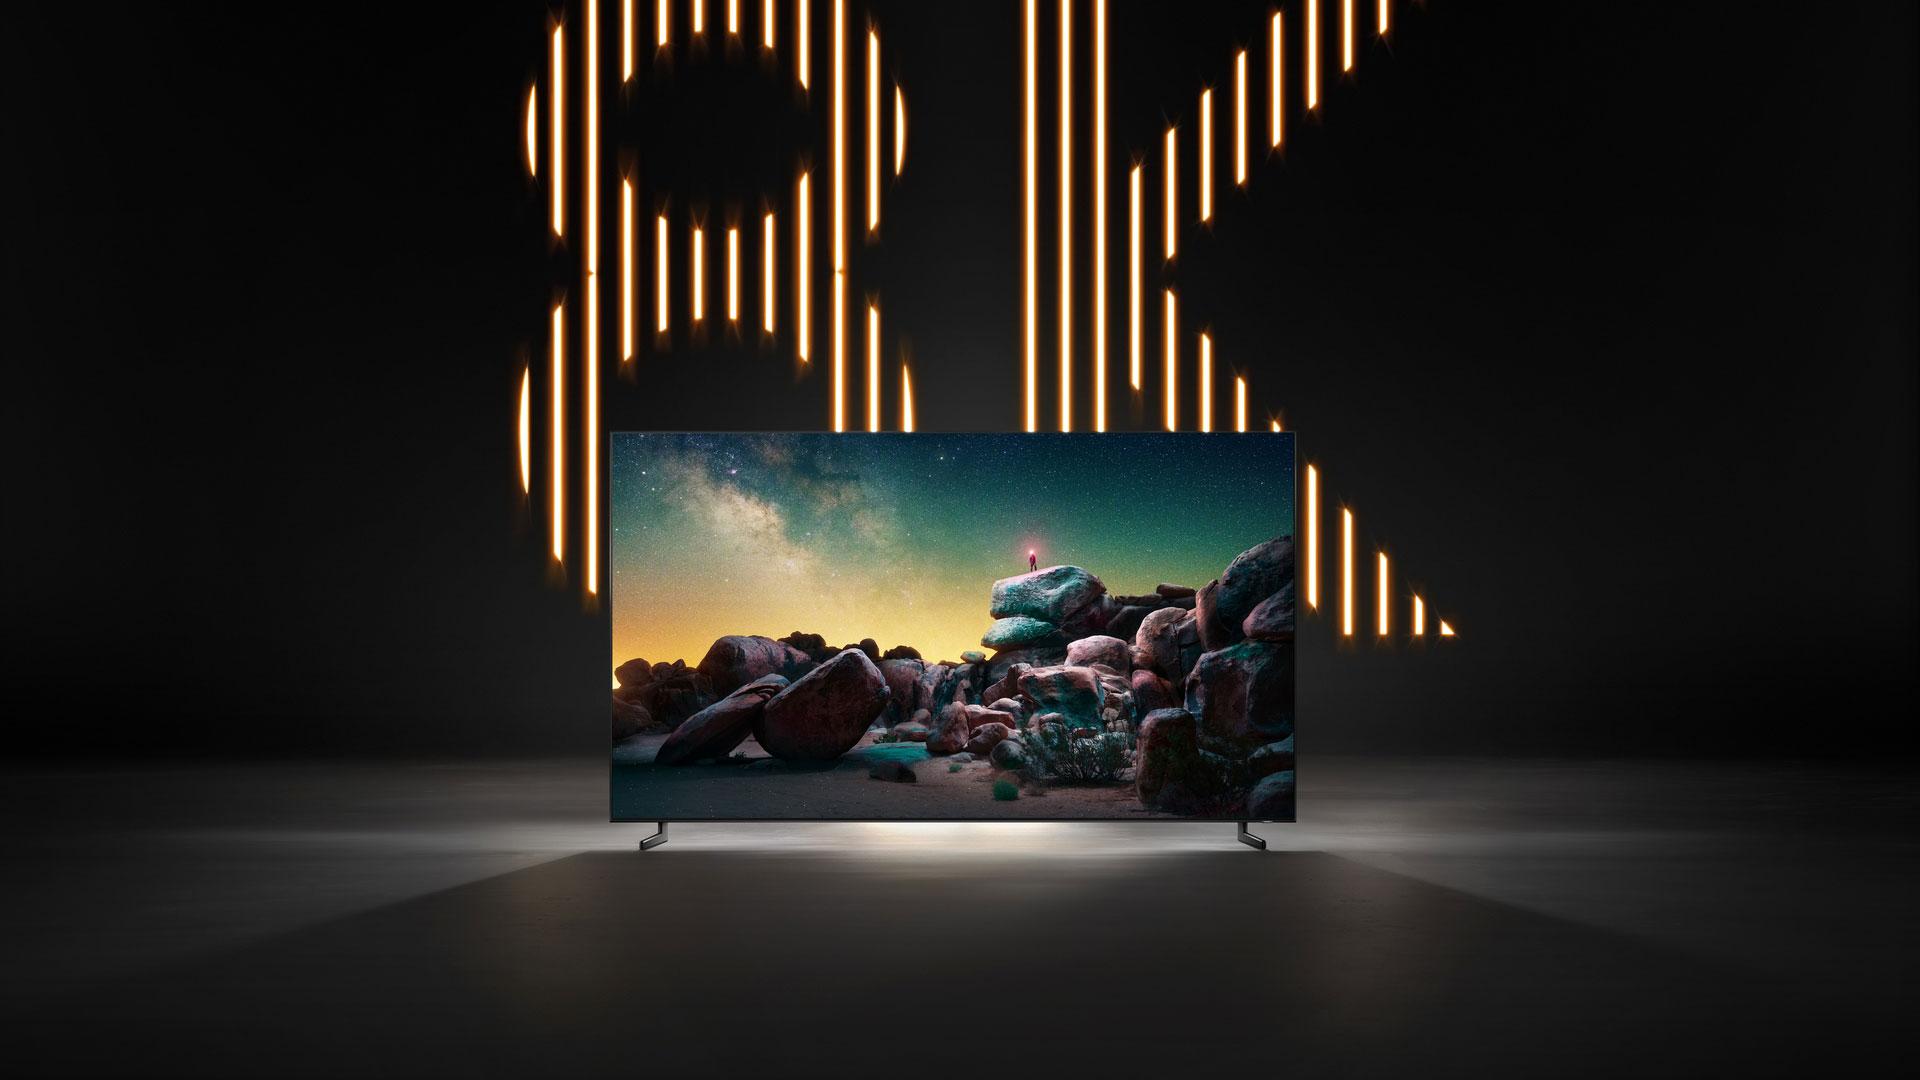 مشخصات تلویزیون 8K توسط انجمن 8K اعلام شد